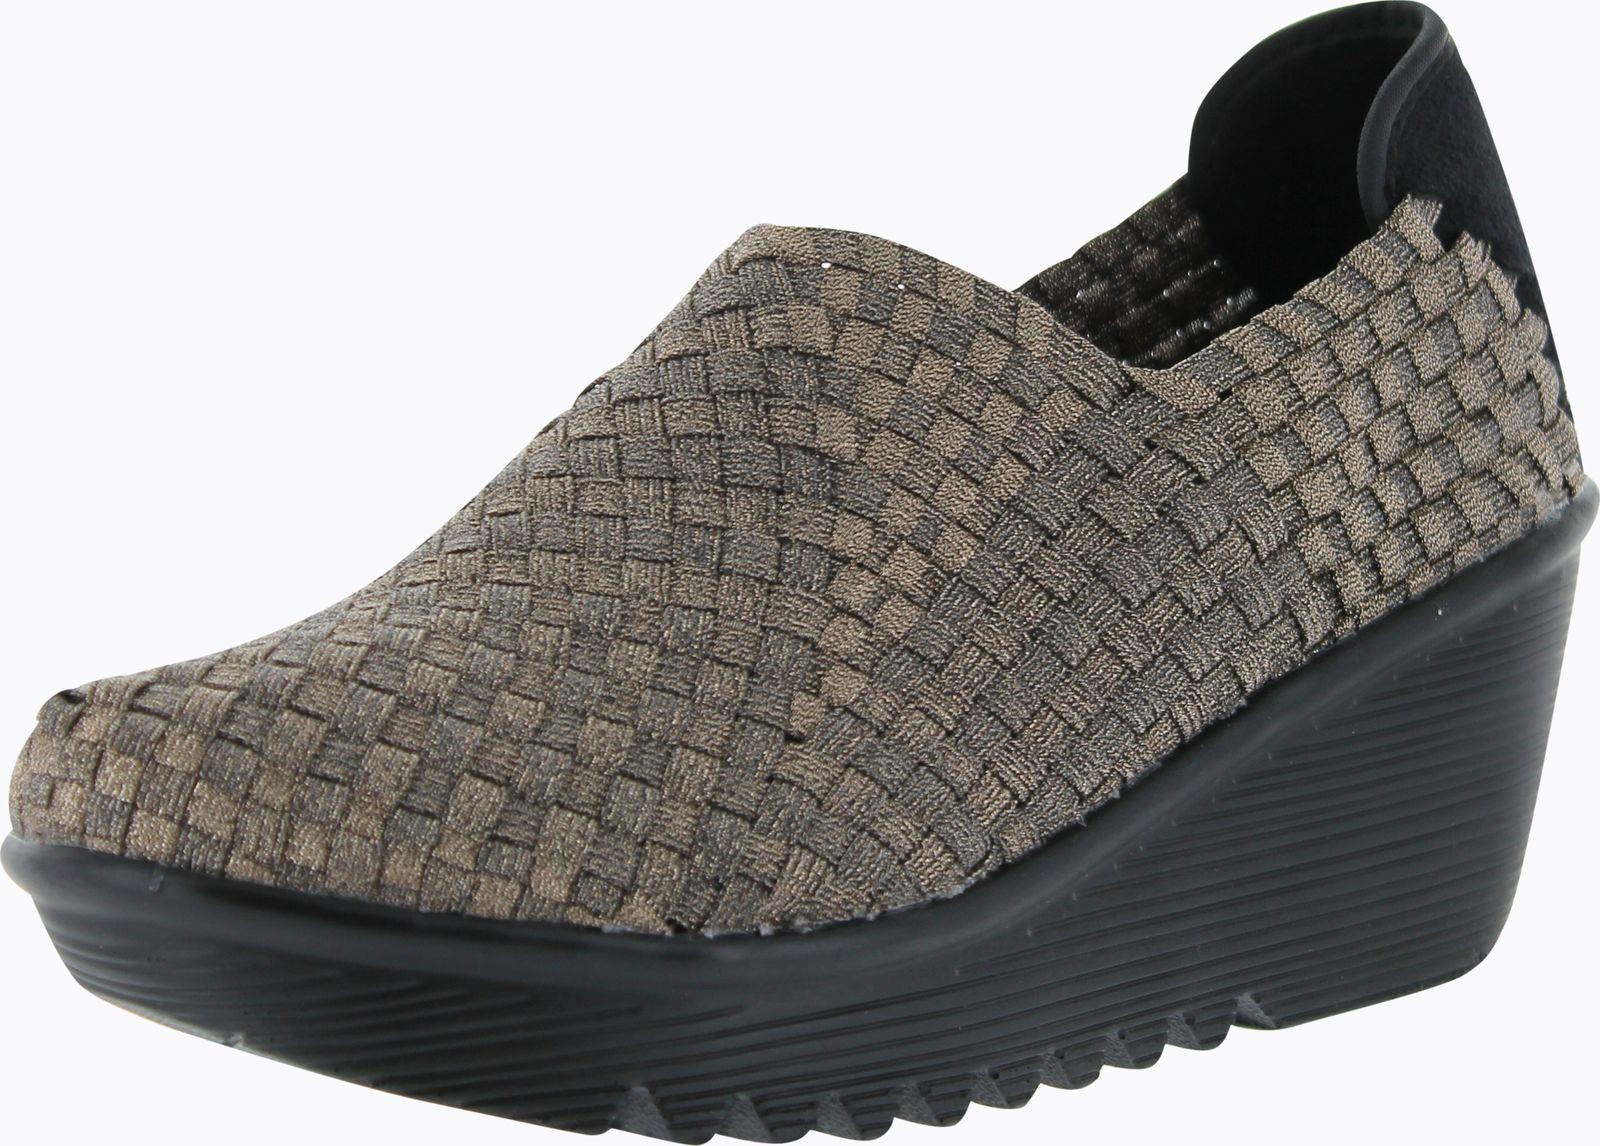 Bernie Mev Shoes Womens Heels